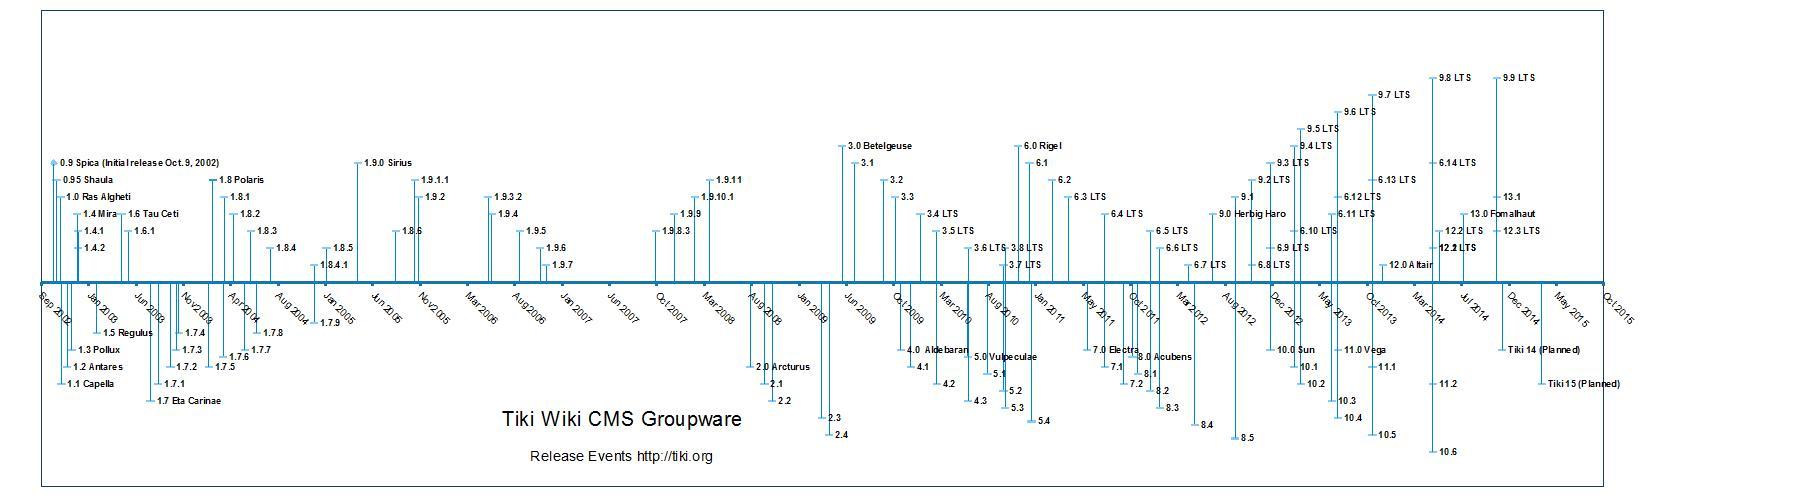 Tiki release timeline